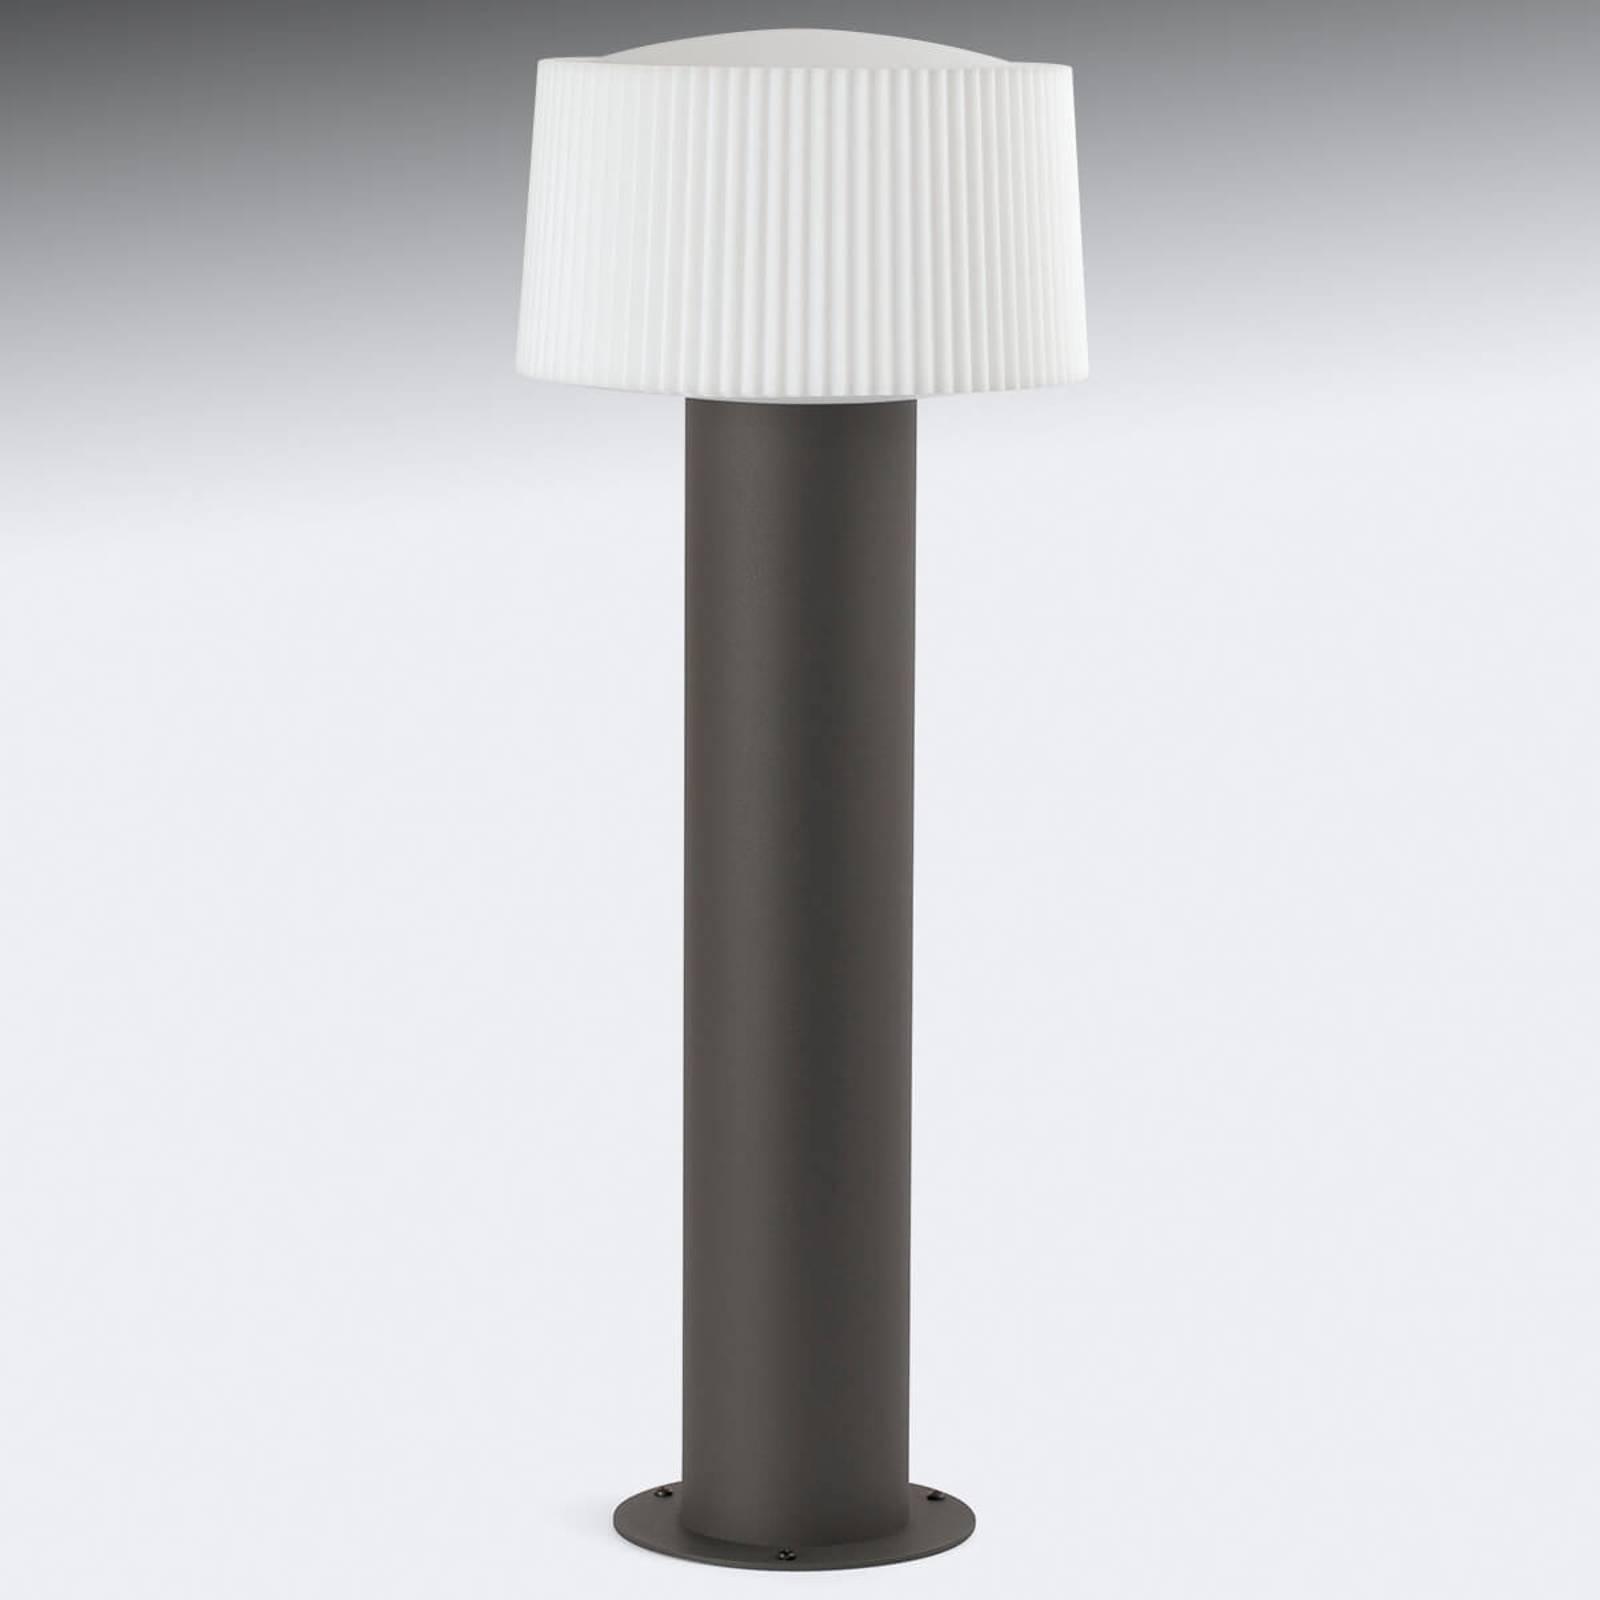 Pollarilamppu Muffin, uritettu varjostin, 55,9 cm